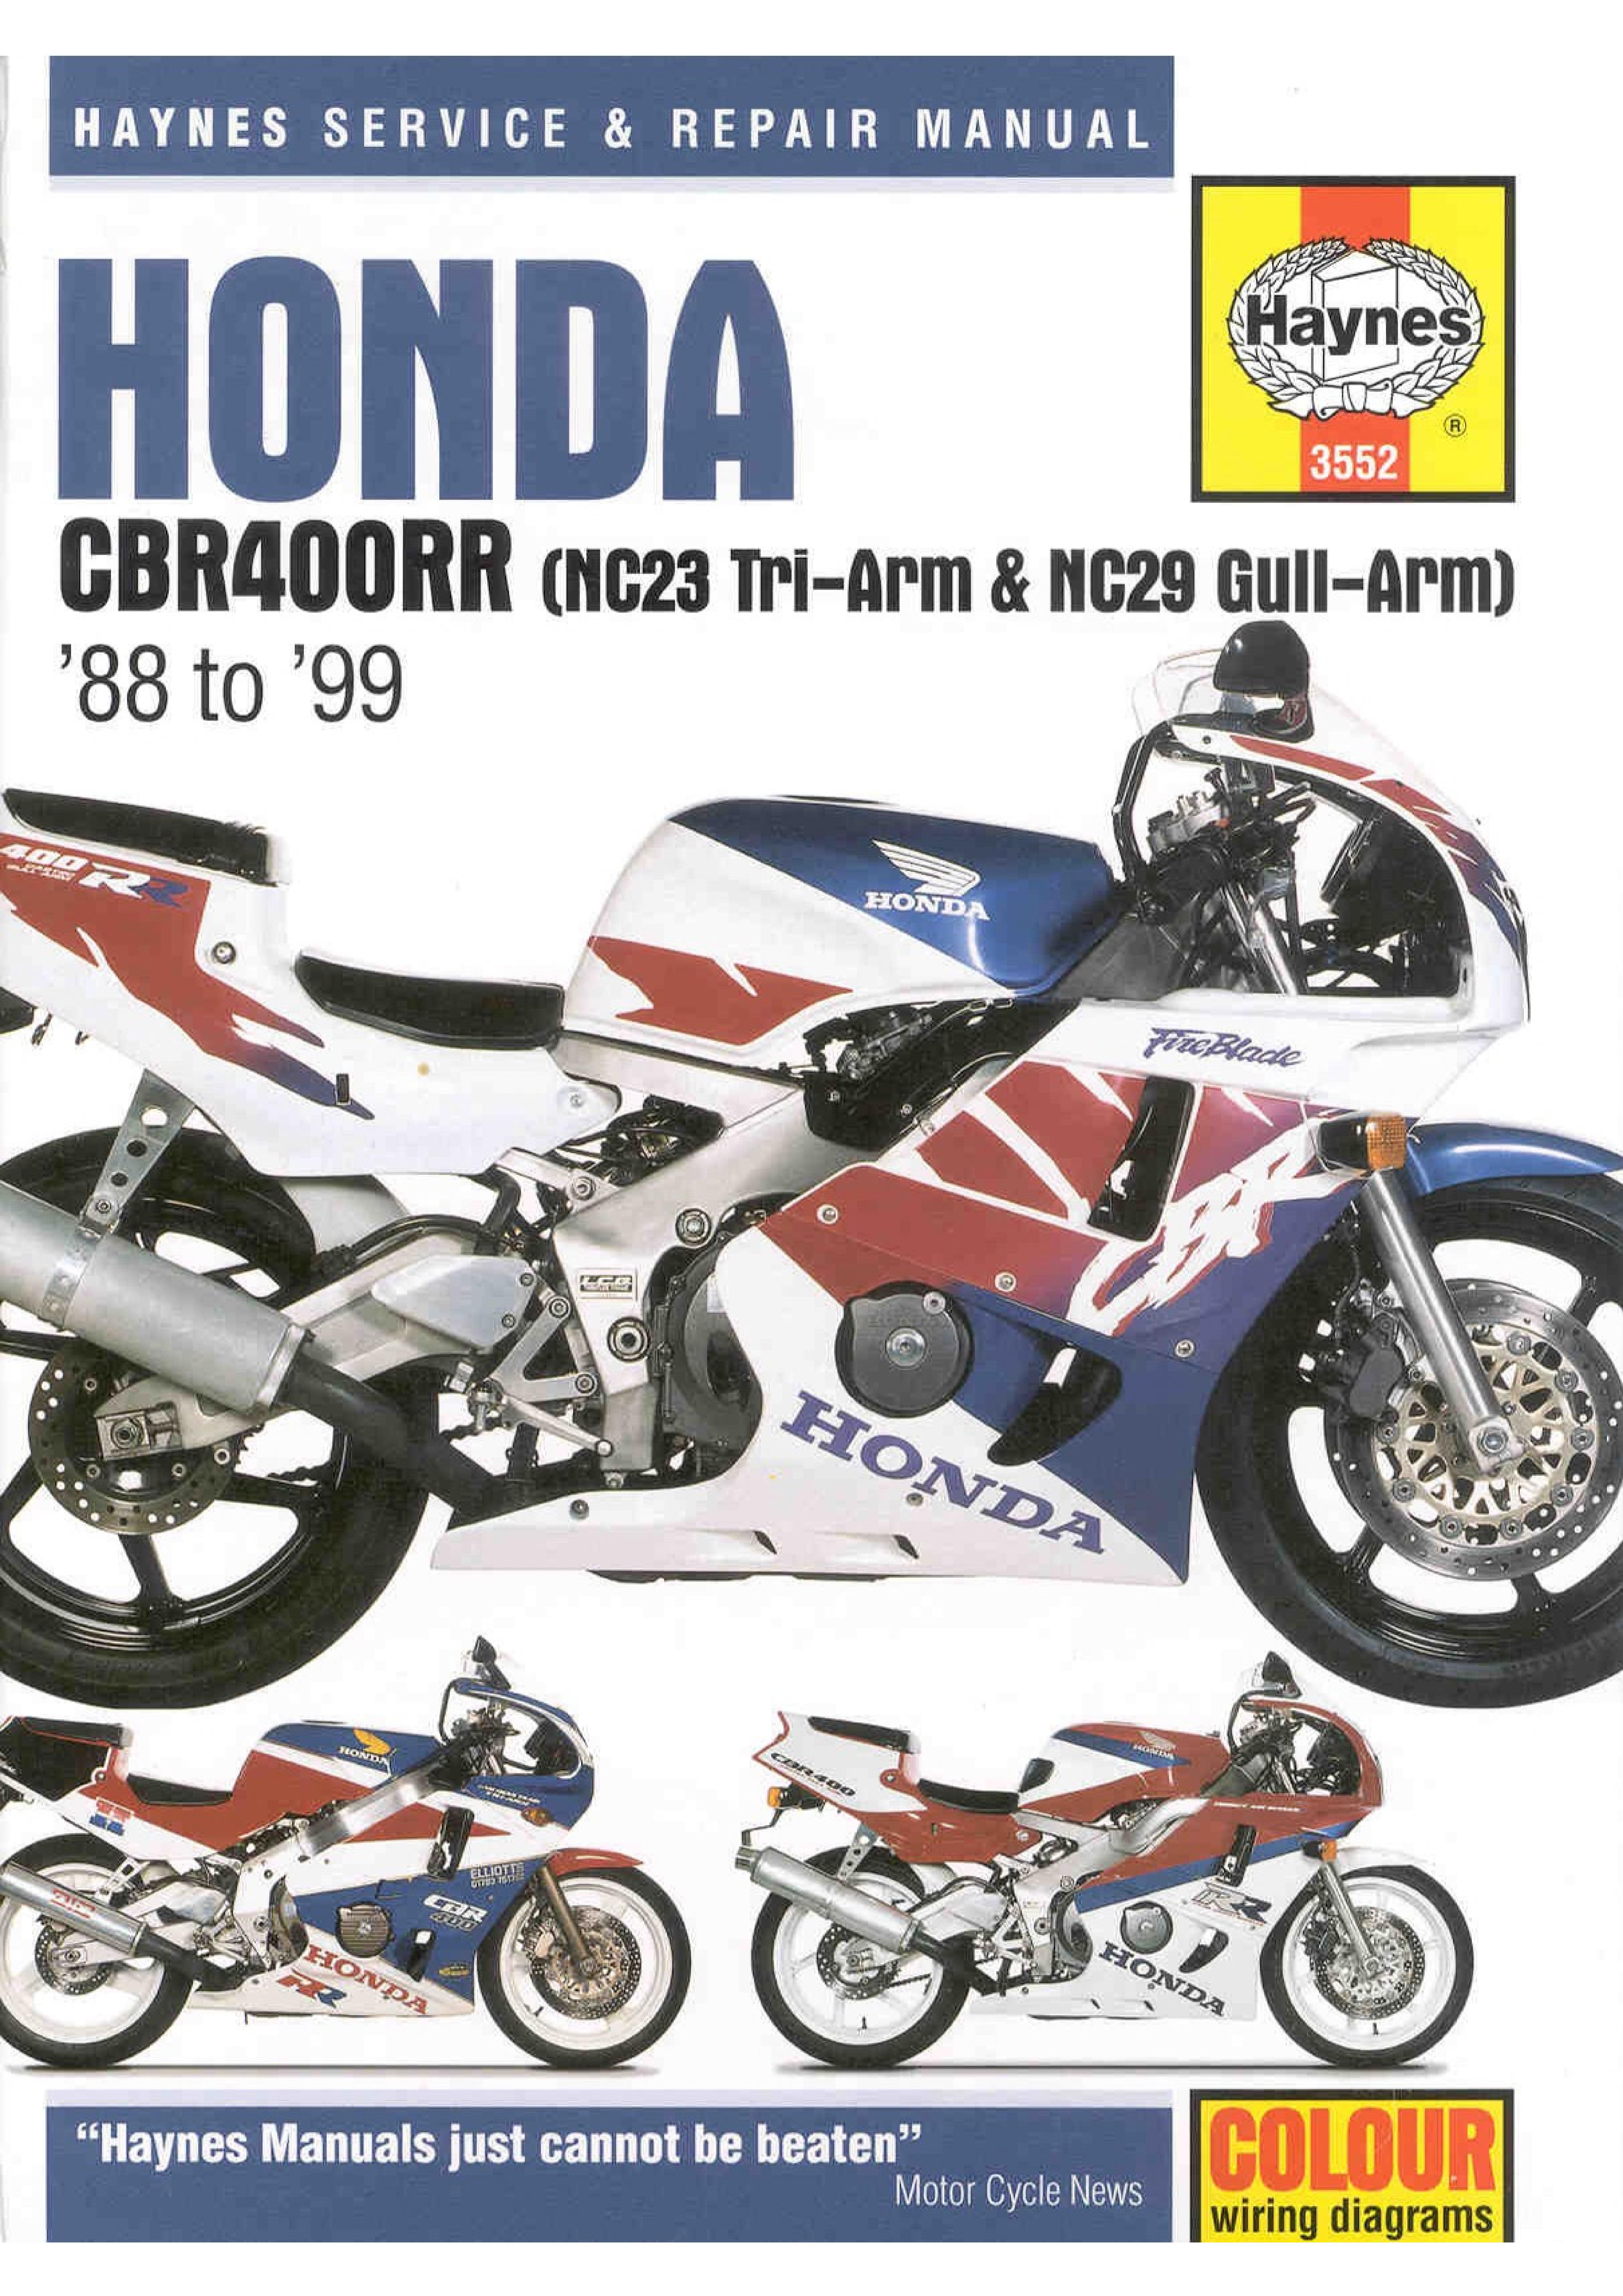 Workshop Manual for Honda CBR400 (1988-1999)